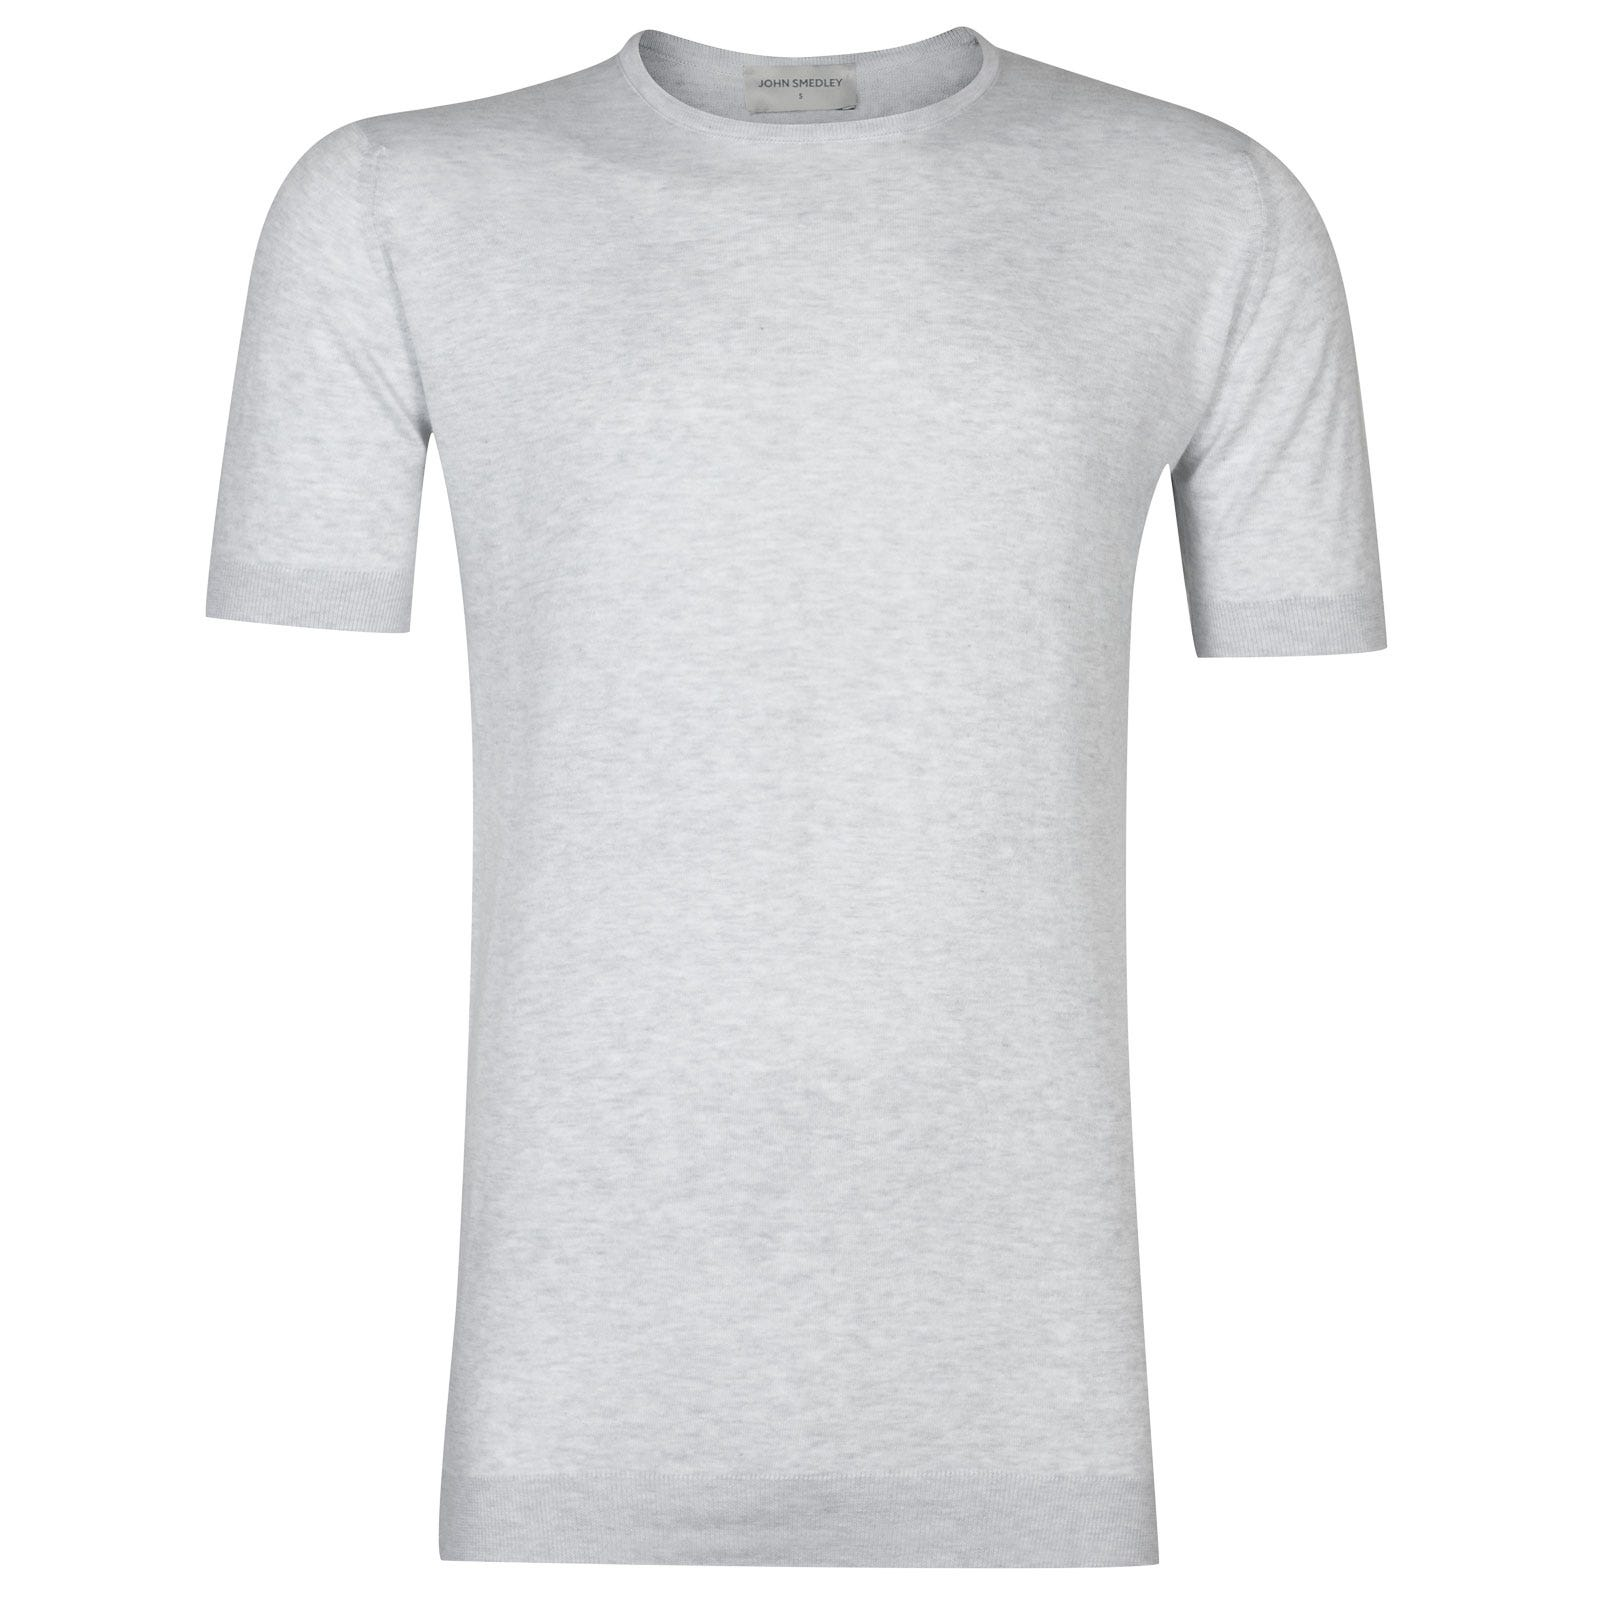 John Smedley belden Sea Island Cotton T-shirt in Feather Grey-M